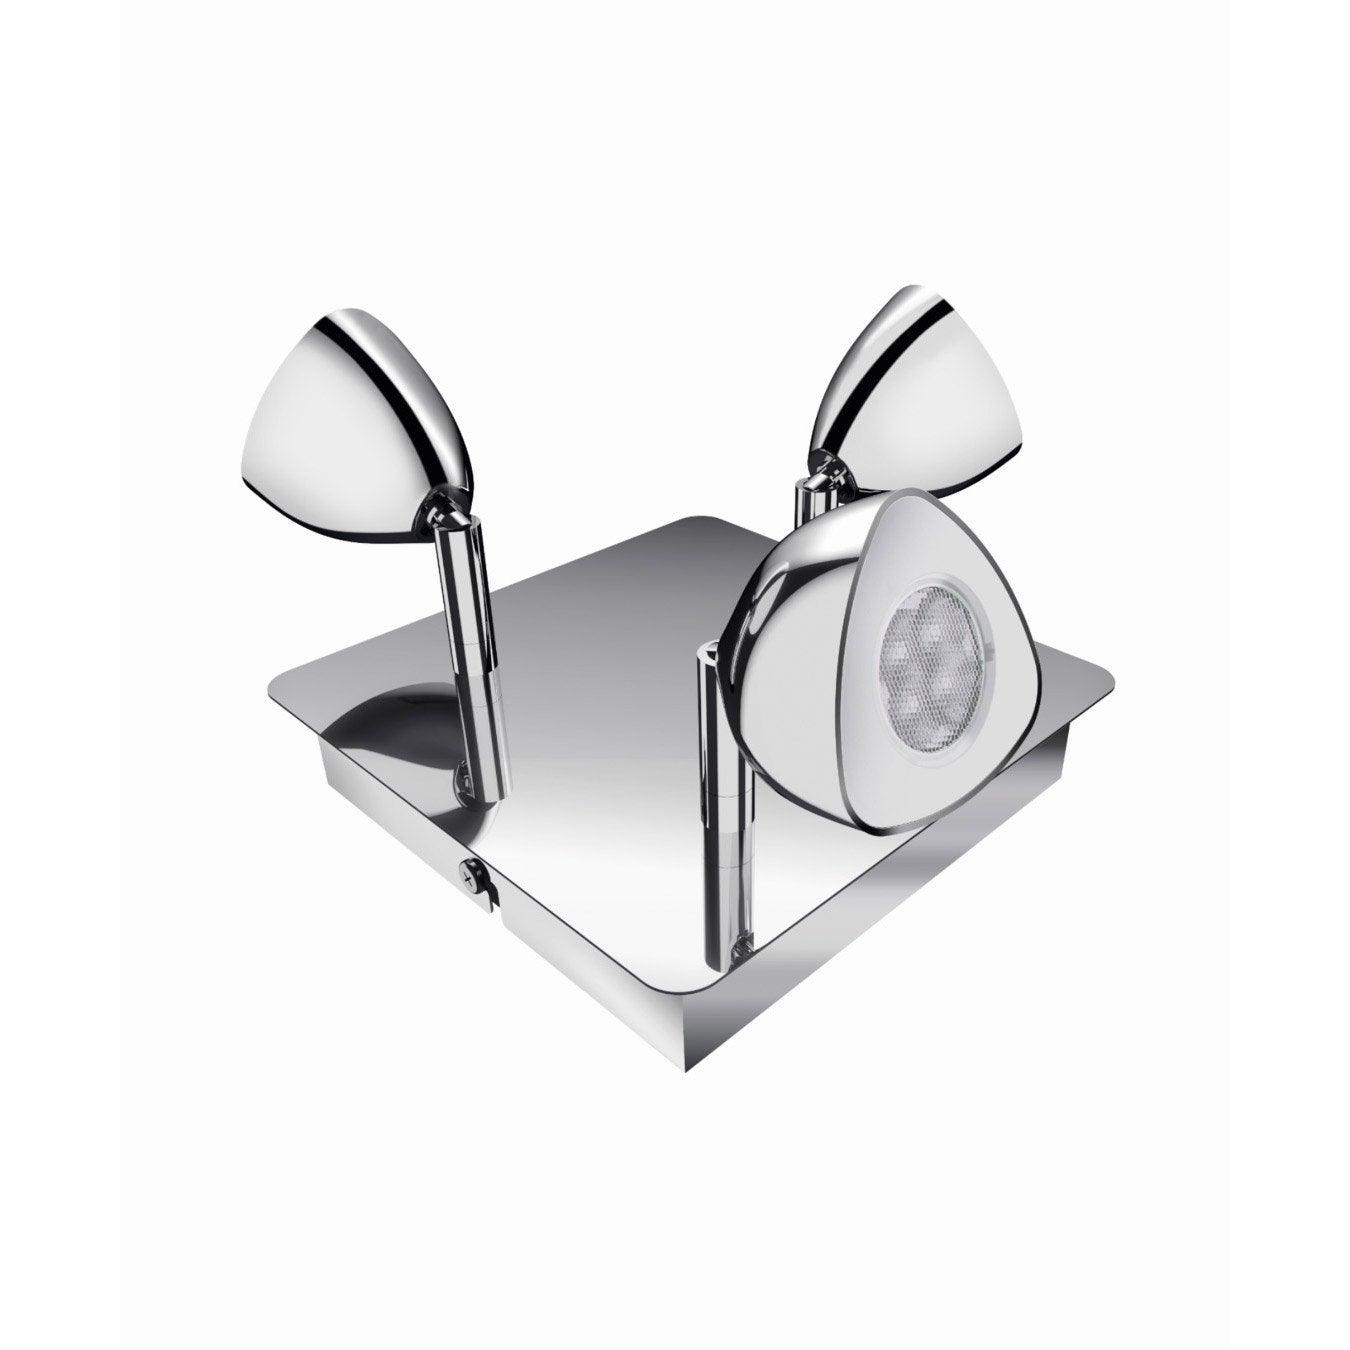 plafonnier 3 spots led int gr e led 3 chrome calyx osram. Black Bedroom Furniture Sets. Home Design Ideas